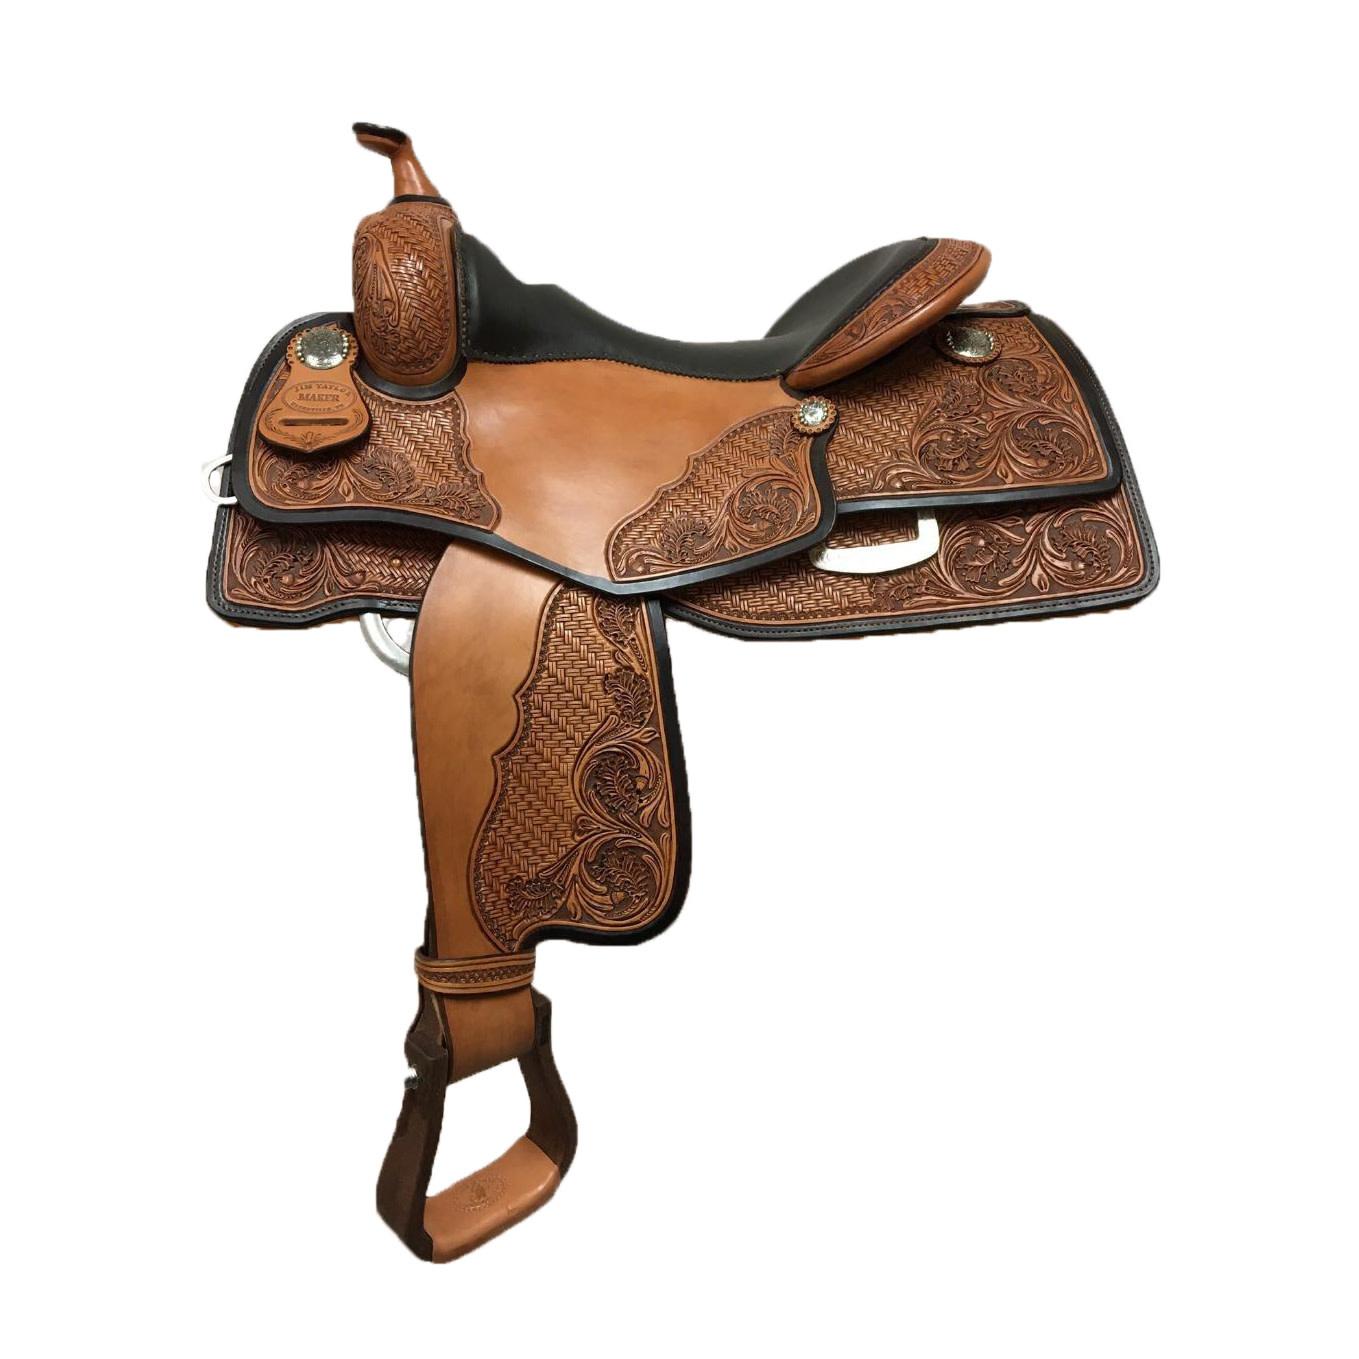 Jim Taylor Custom saddle Jim Taylor example saddle 9